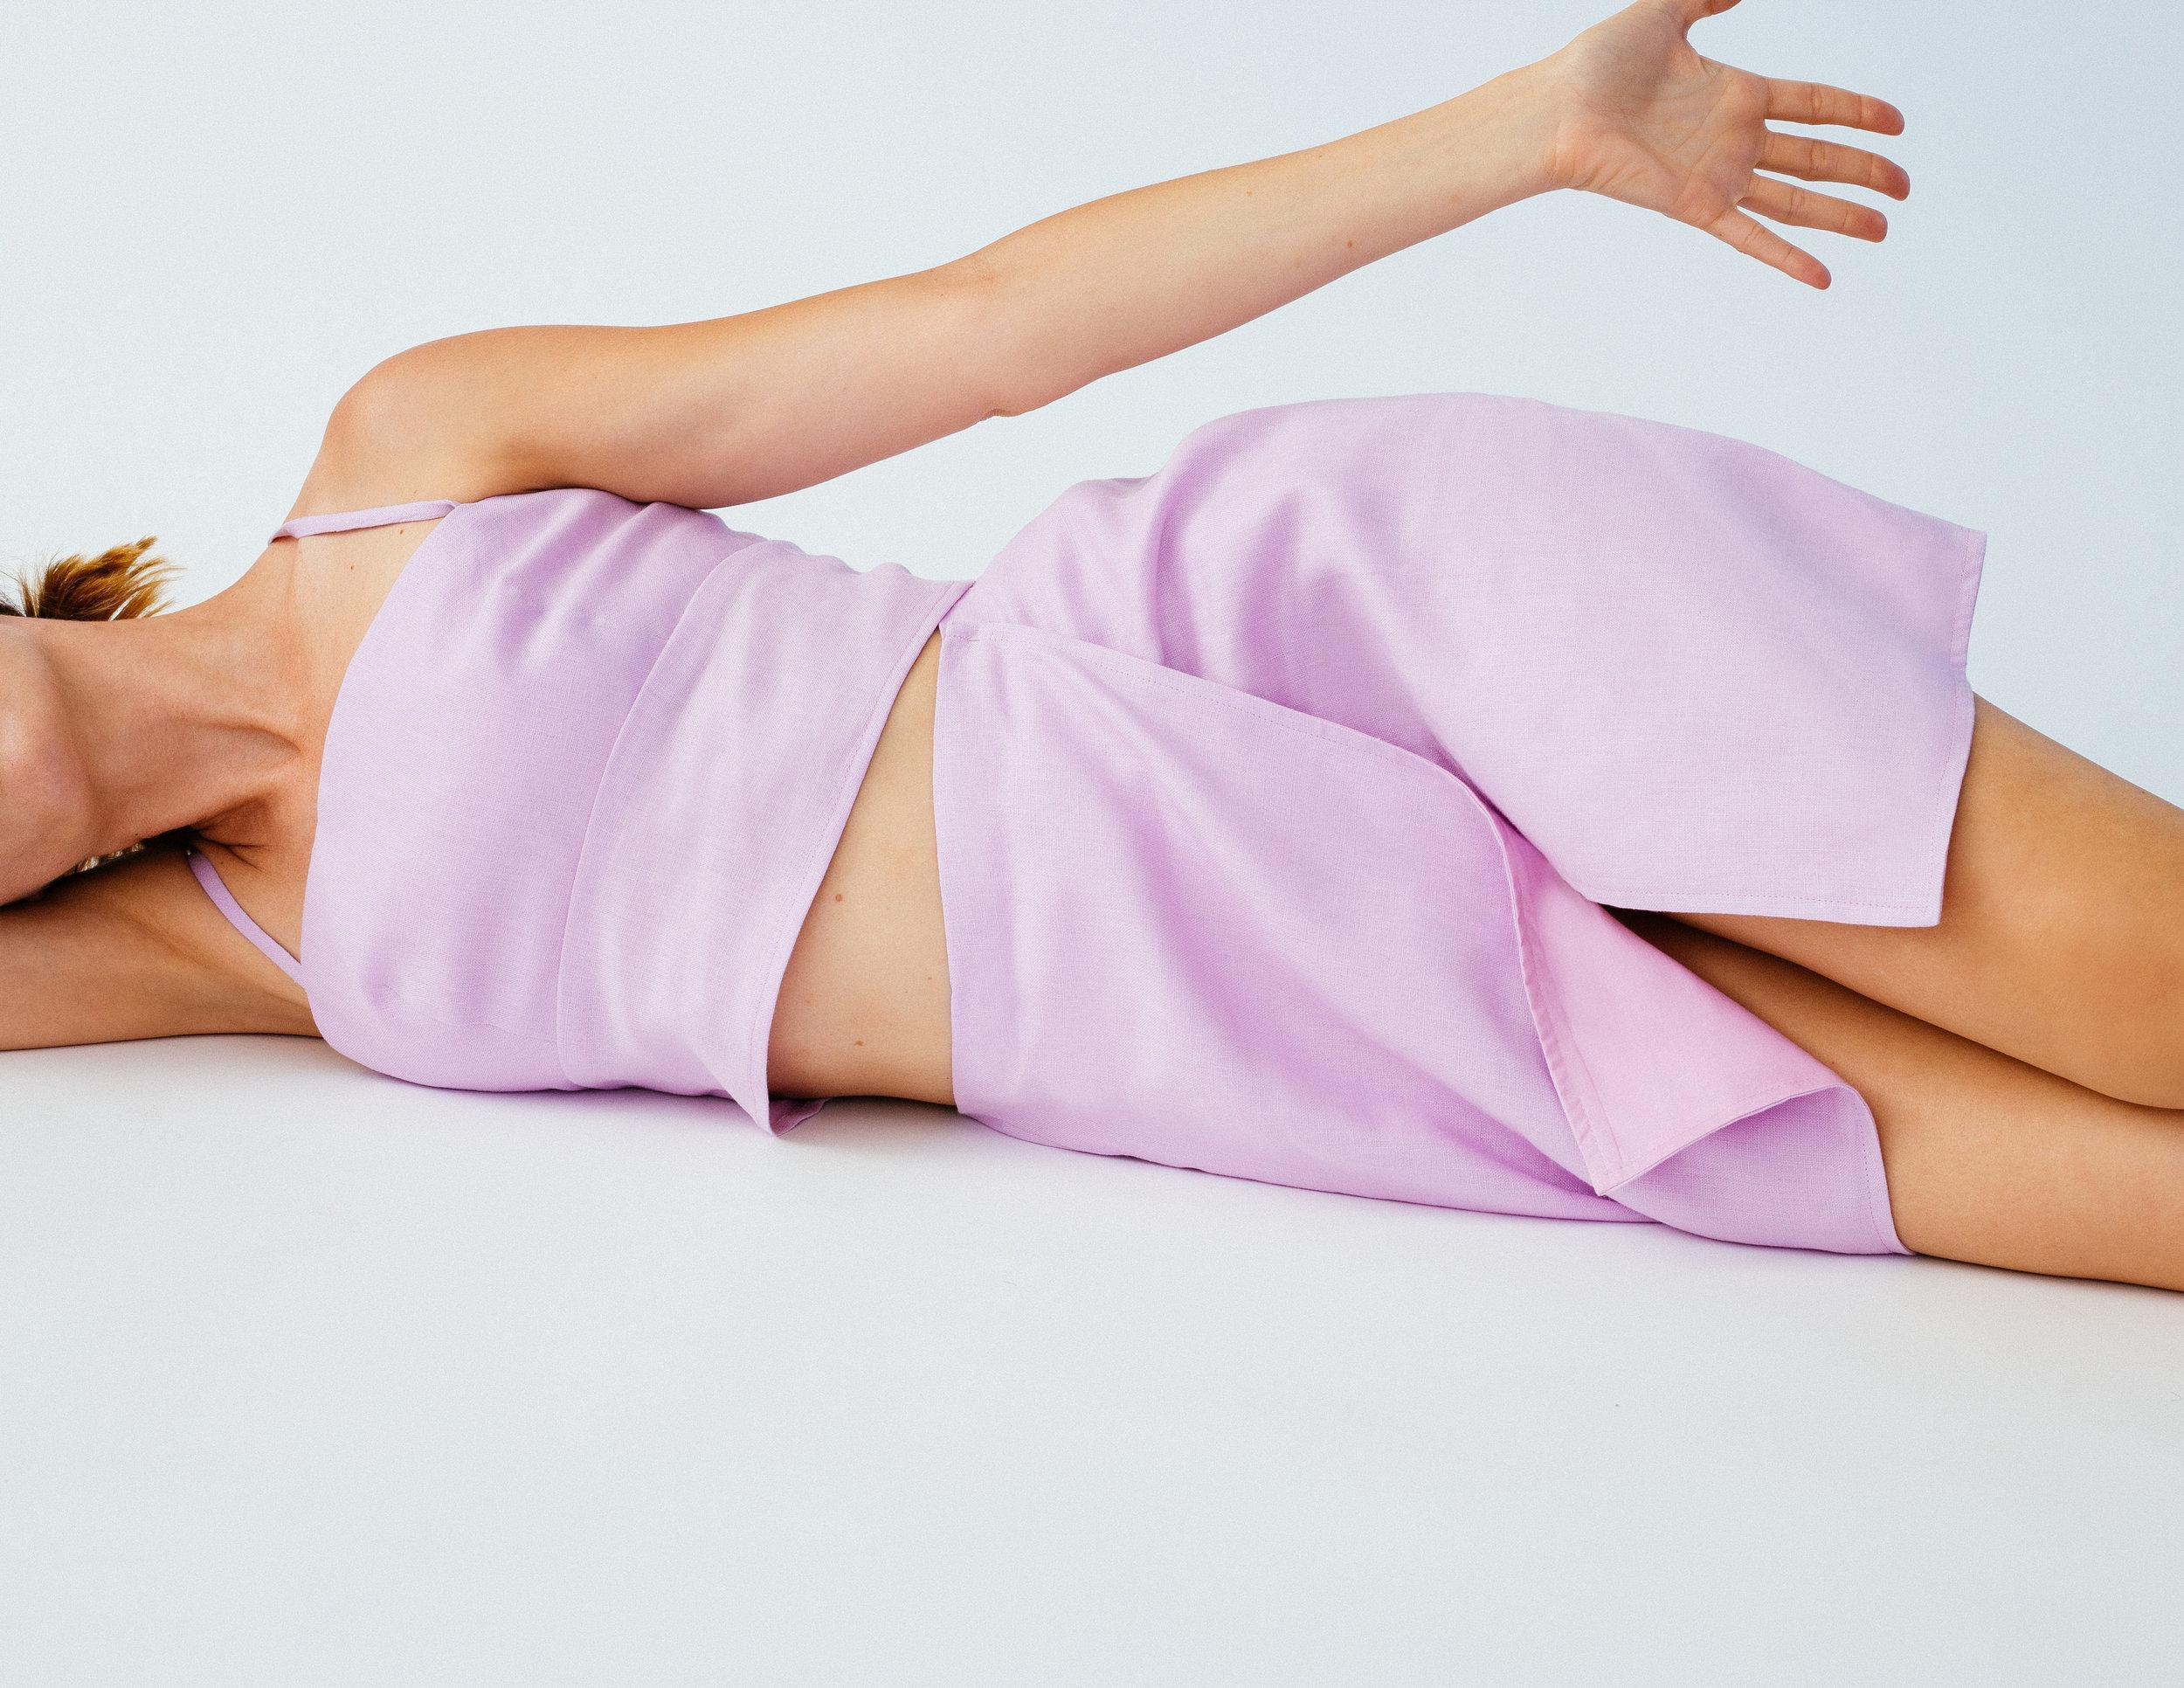 ellice ruiz_wardrobe_emily top_sara skirt